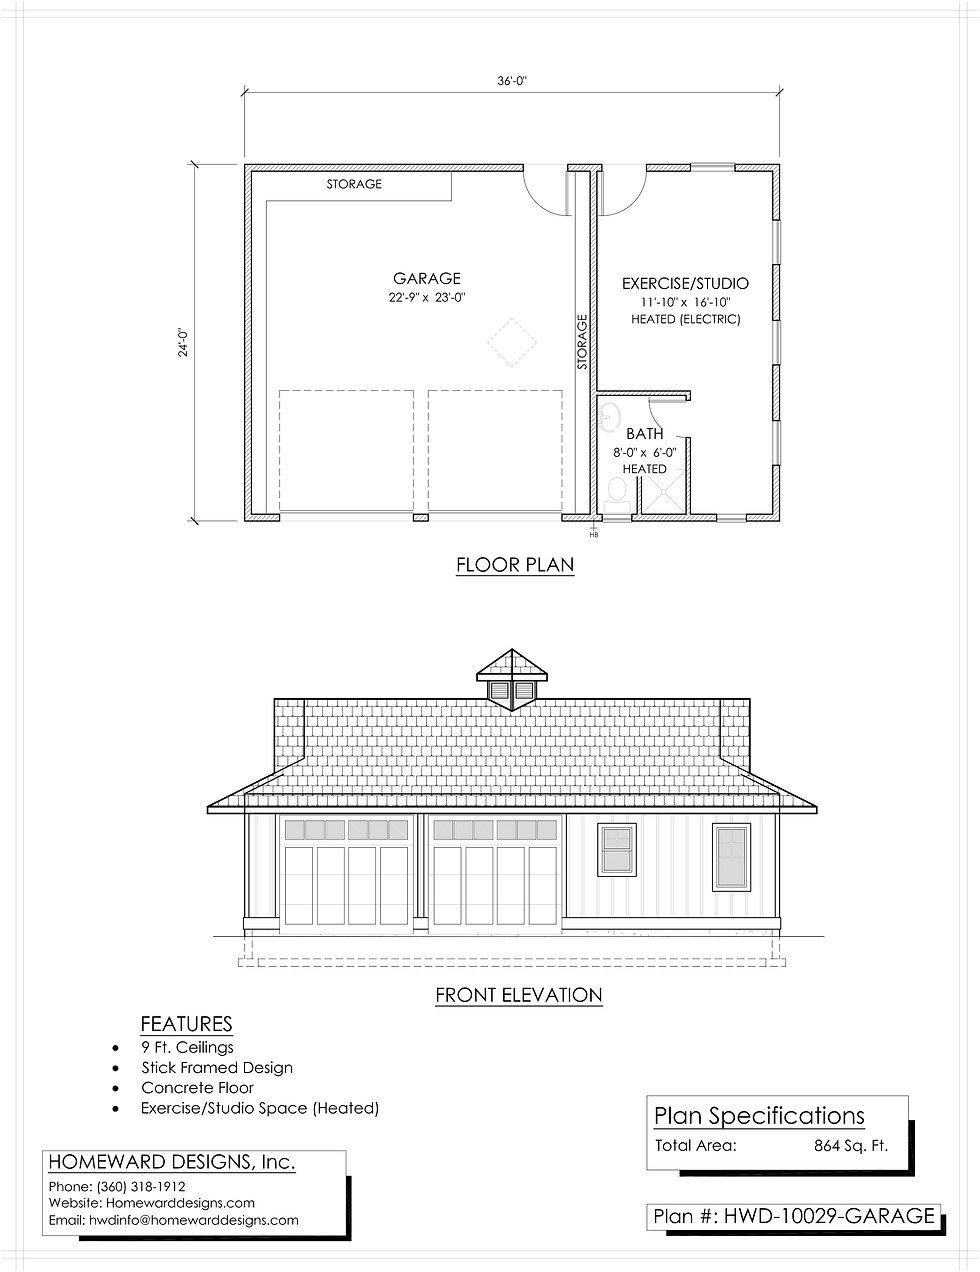 Homeward Designs Stock Plan